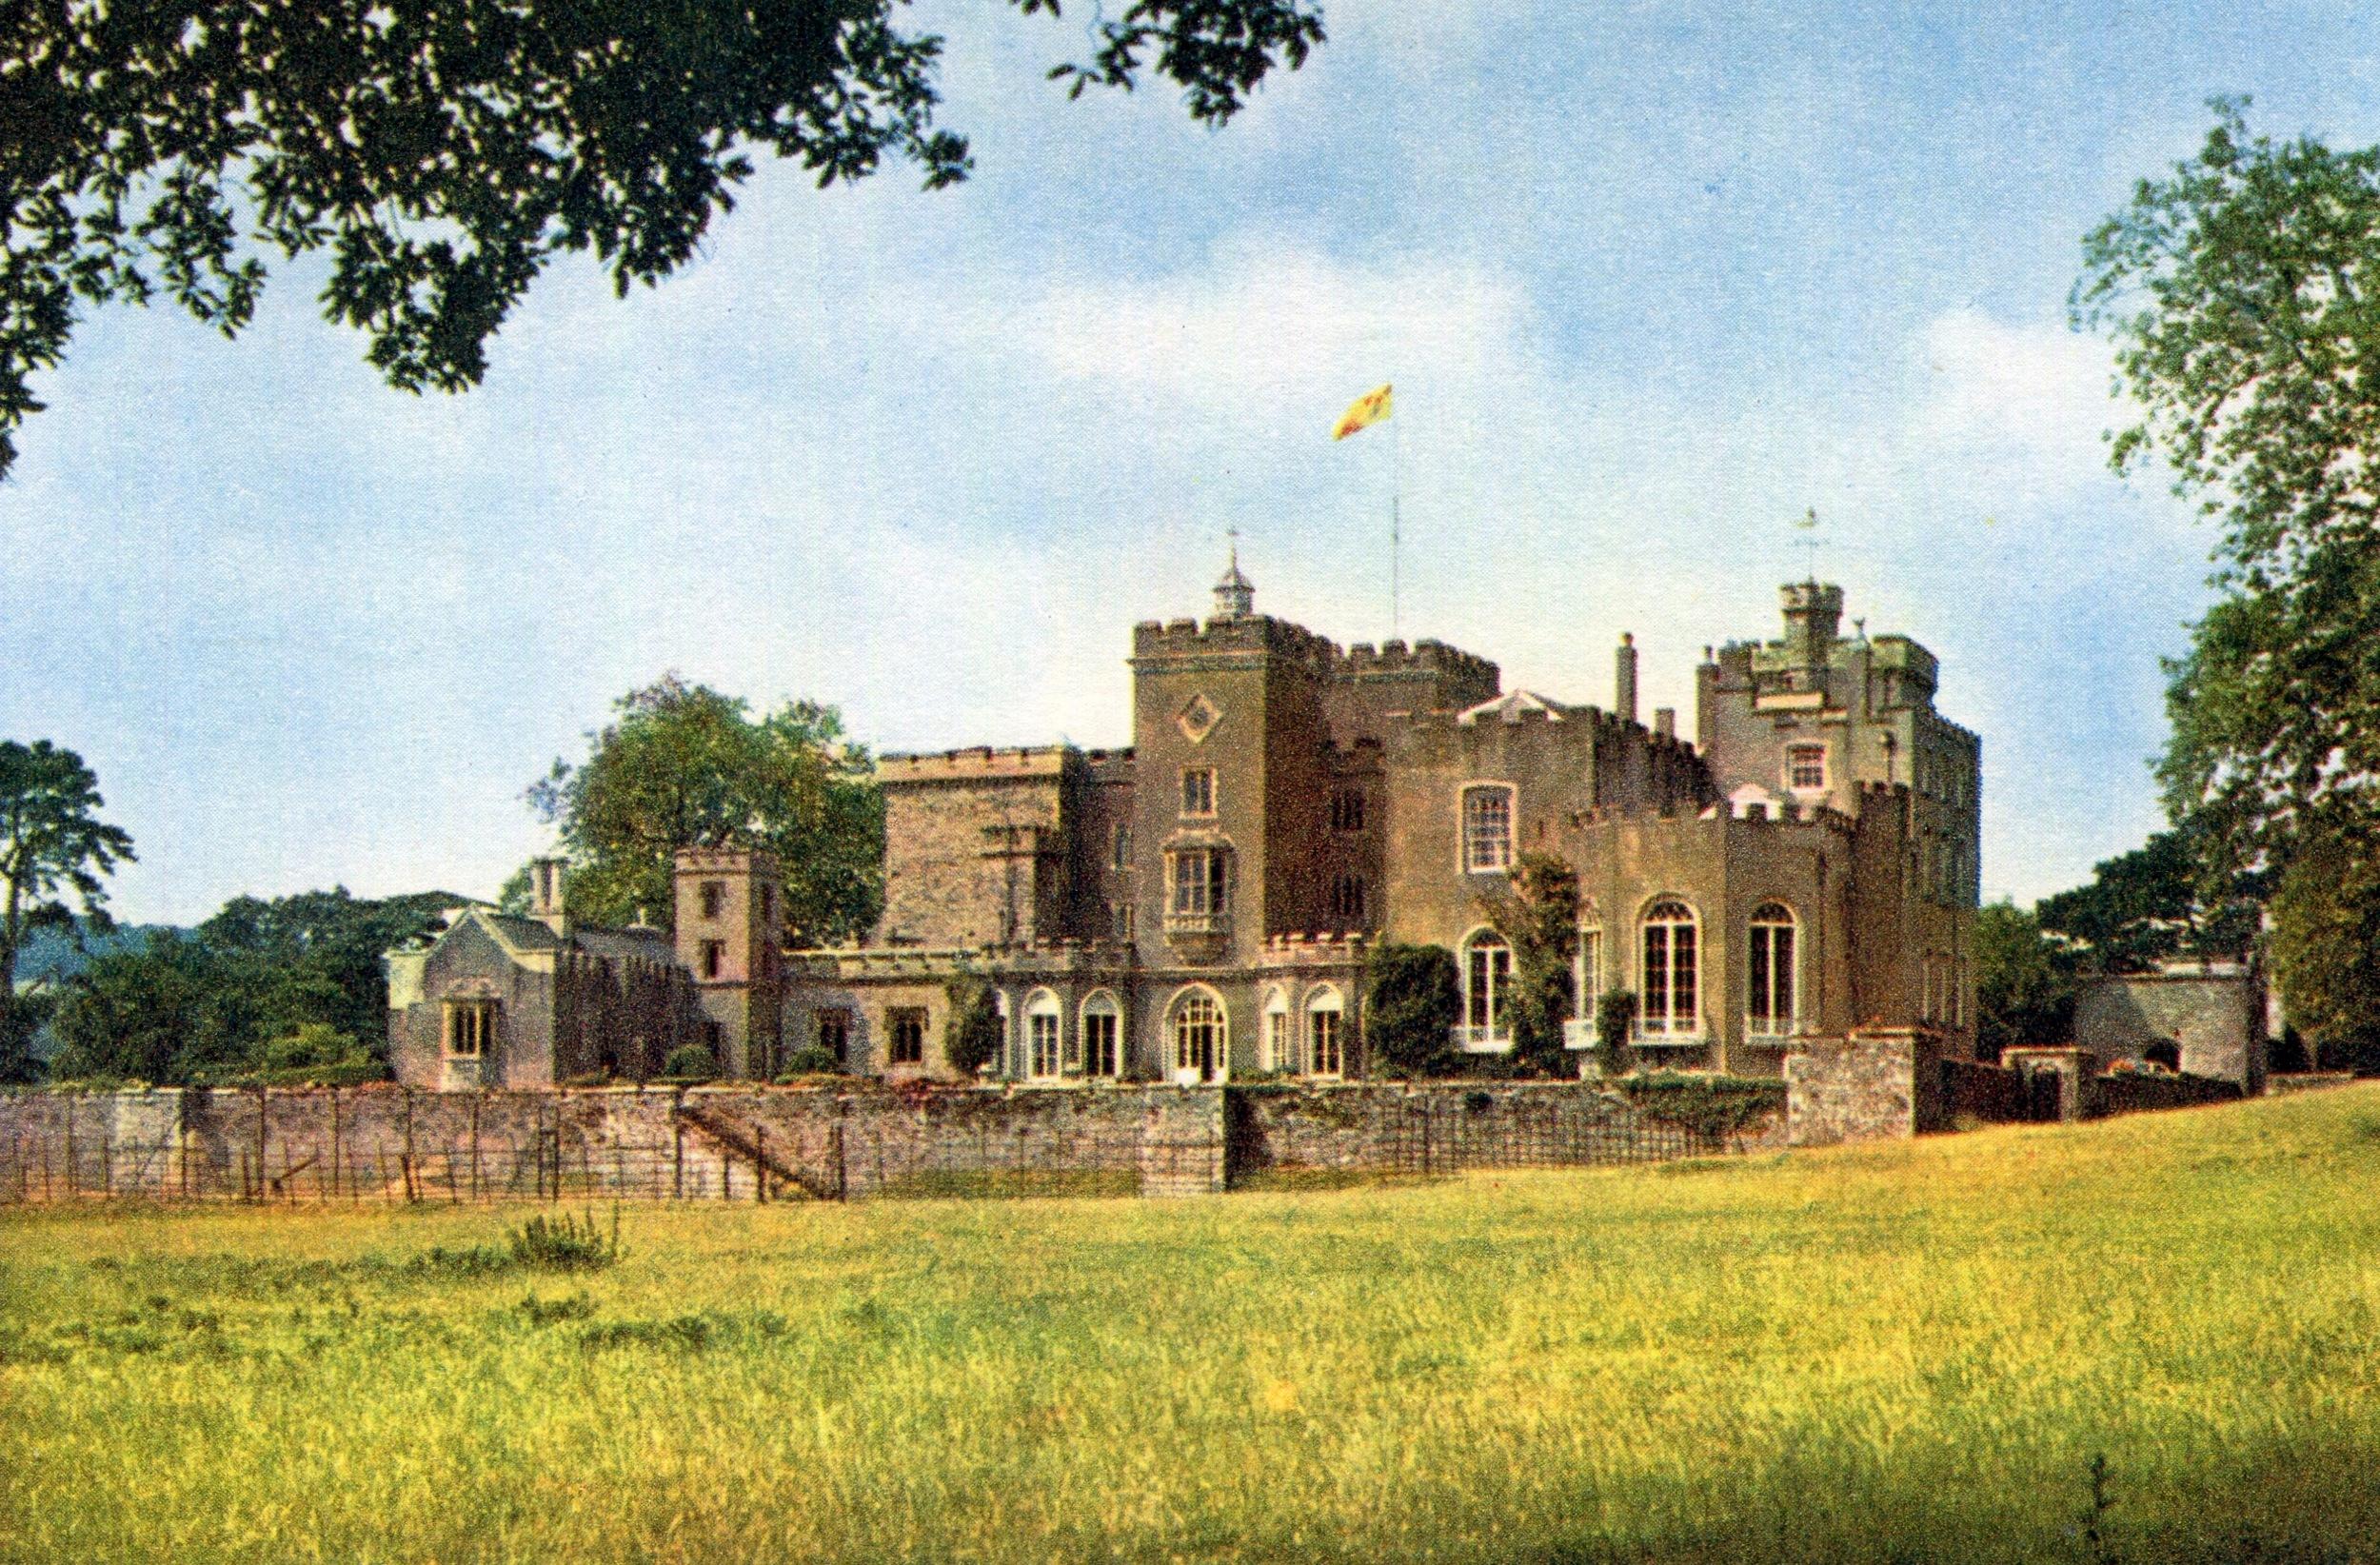 Powderham Castle, England